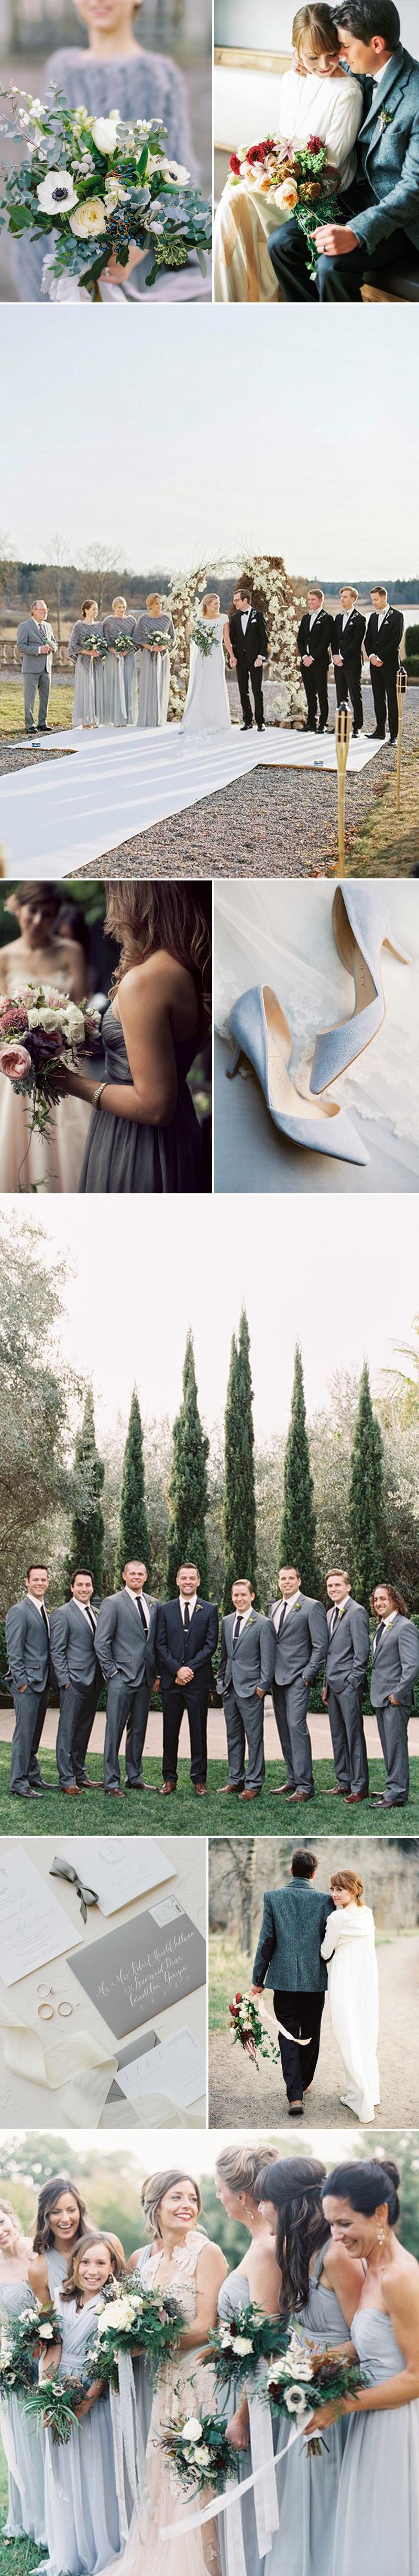 Winter Gray Weddings